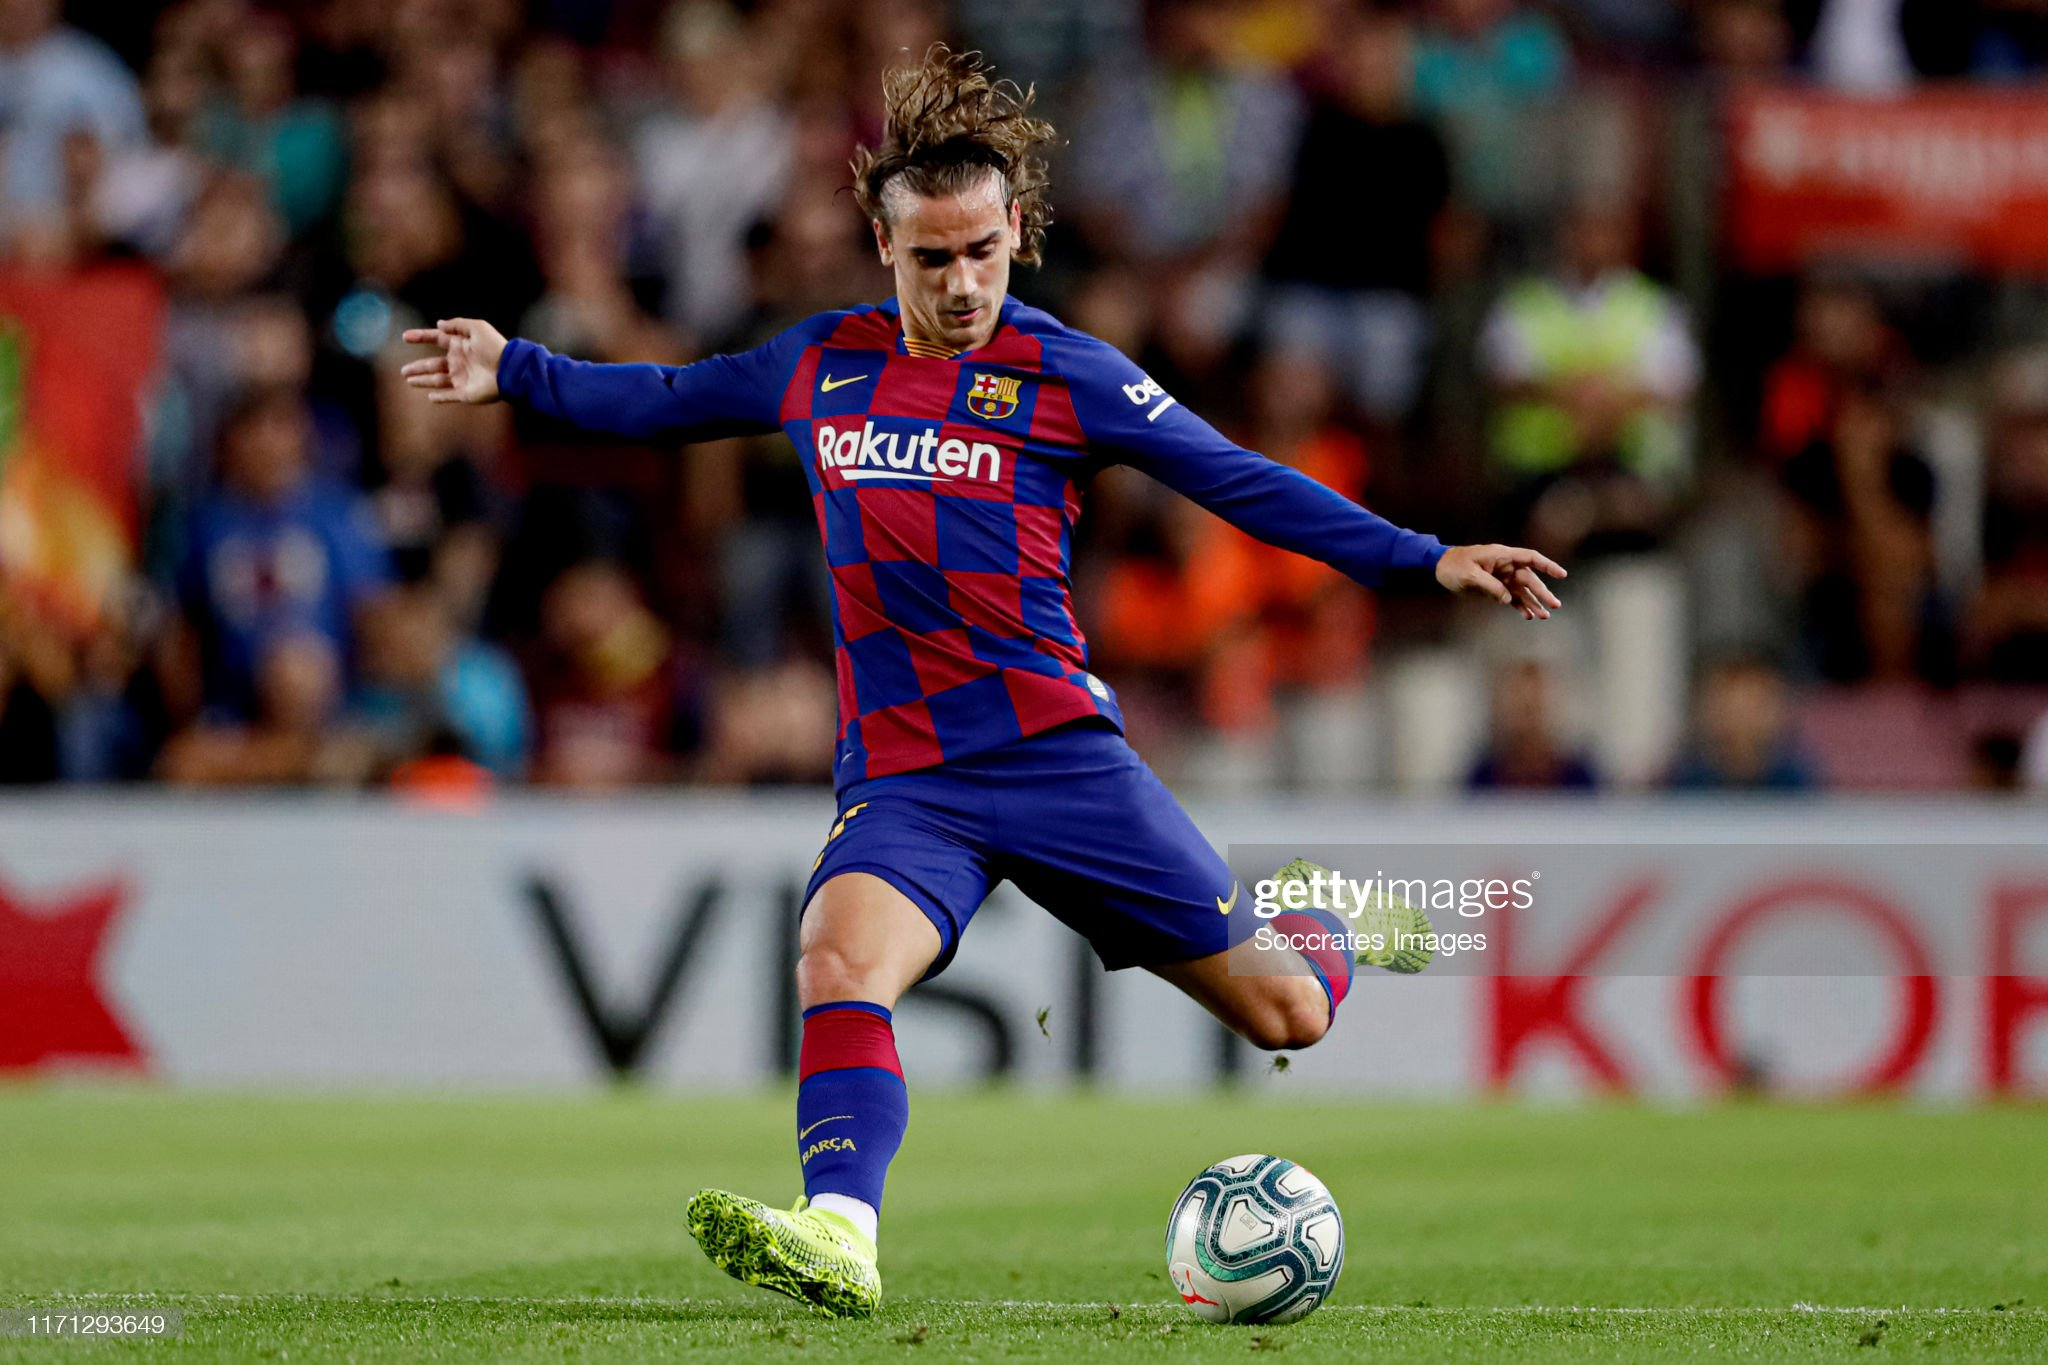 صور مباراة : برشلونة - فياريال 2-1 ( 24-09-2019 )  Antoine-griezmann-of-fc-barcelona-during-the-la-liga-santander-match-picture-id1171293649?s=2048x2048